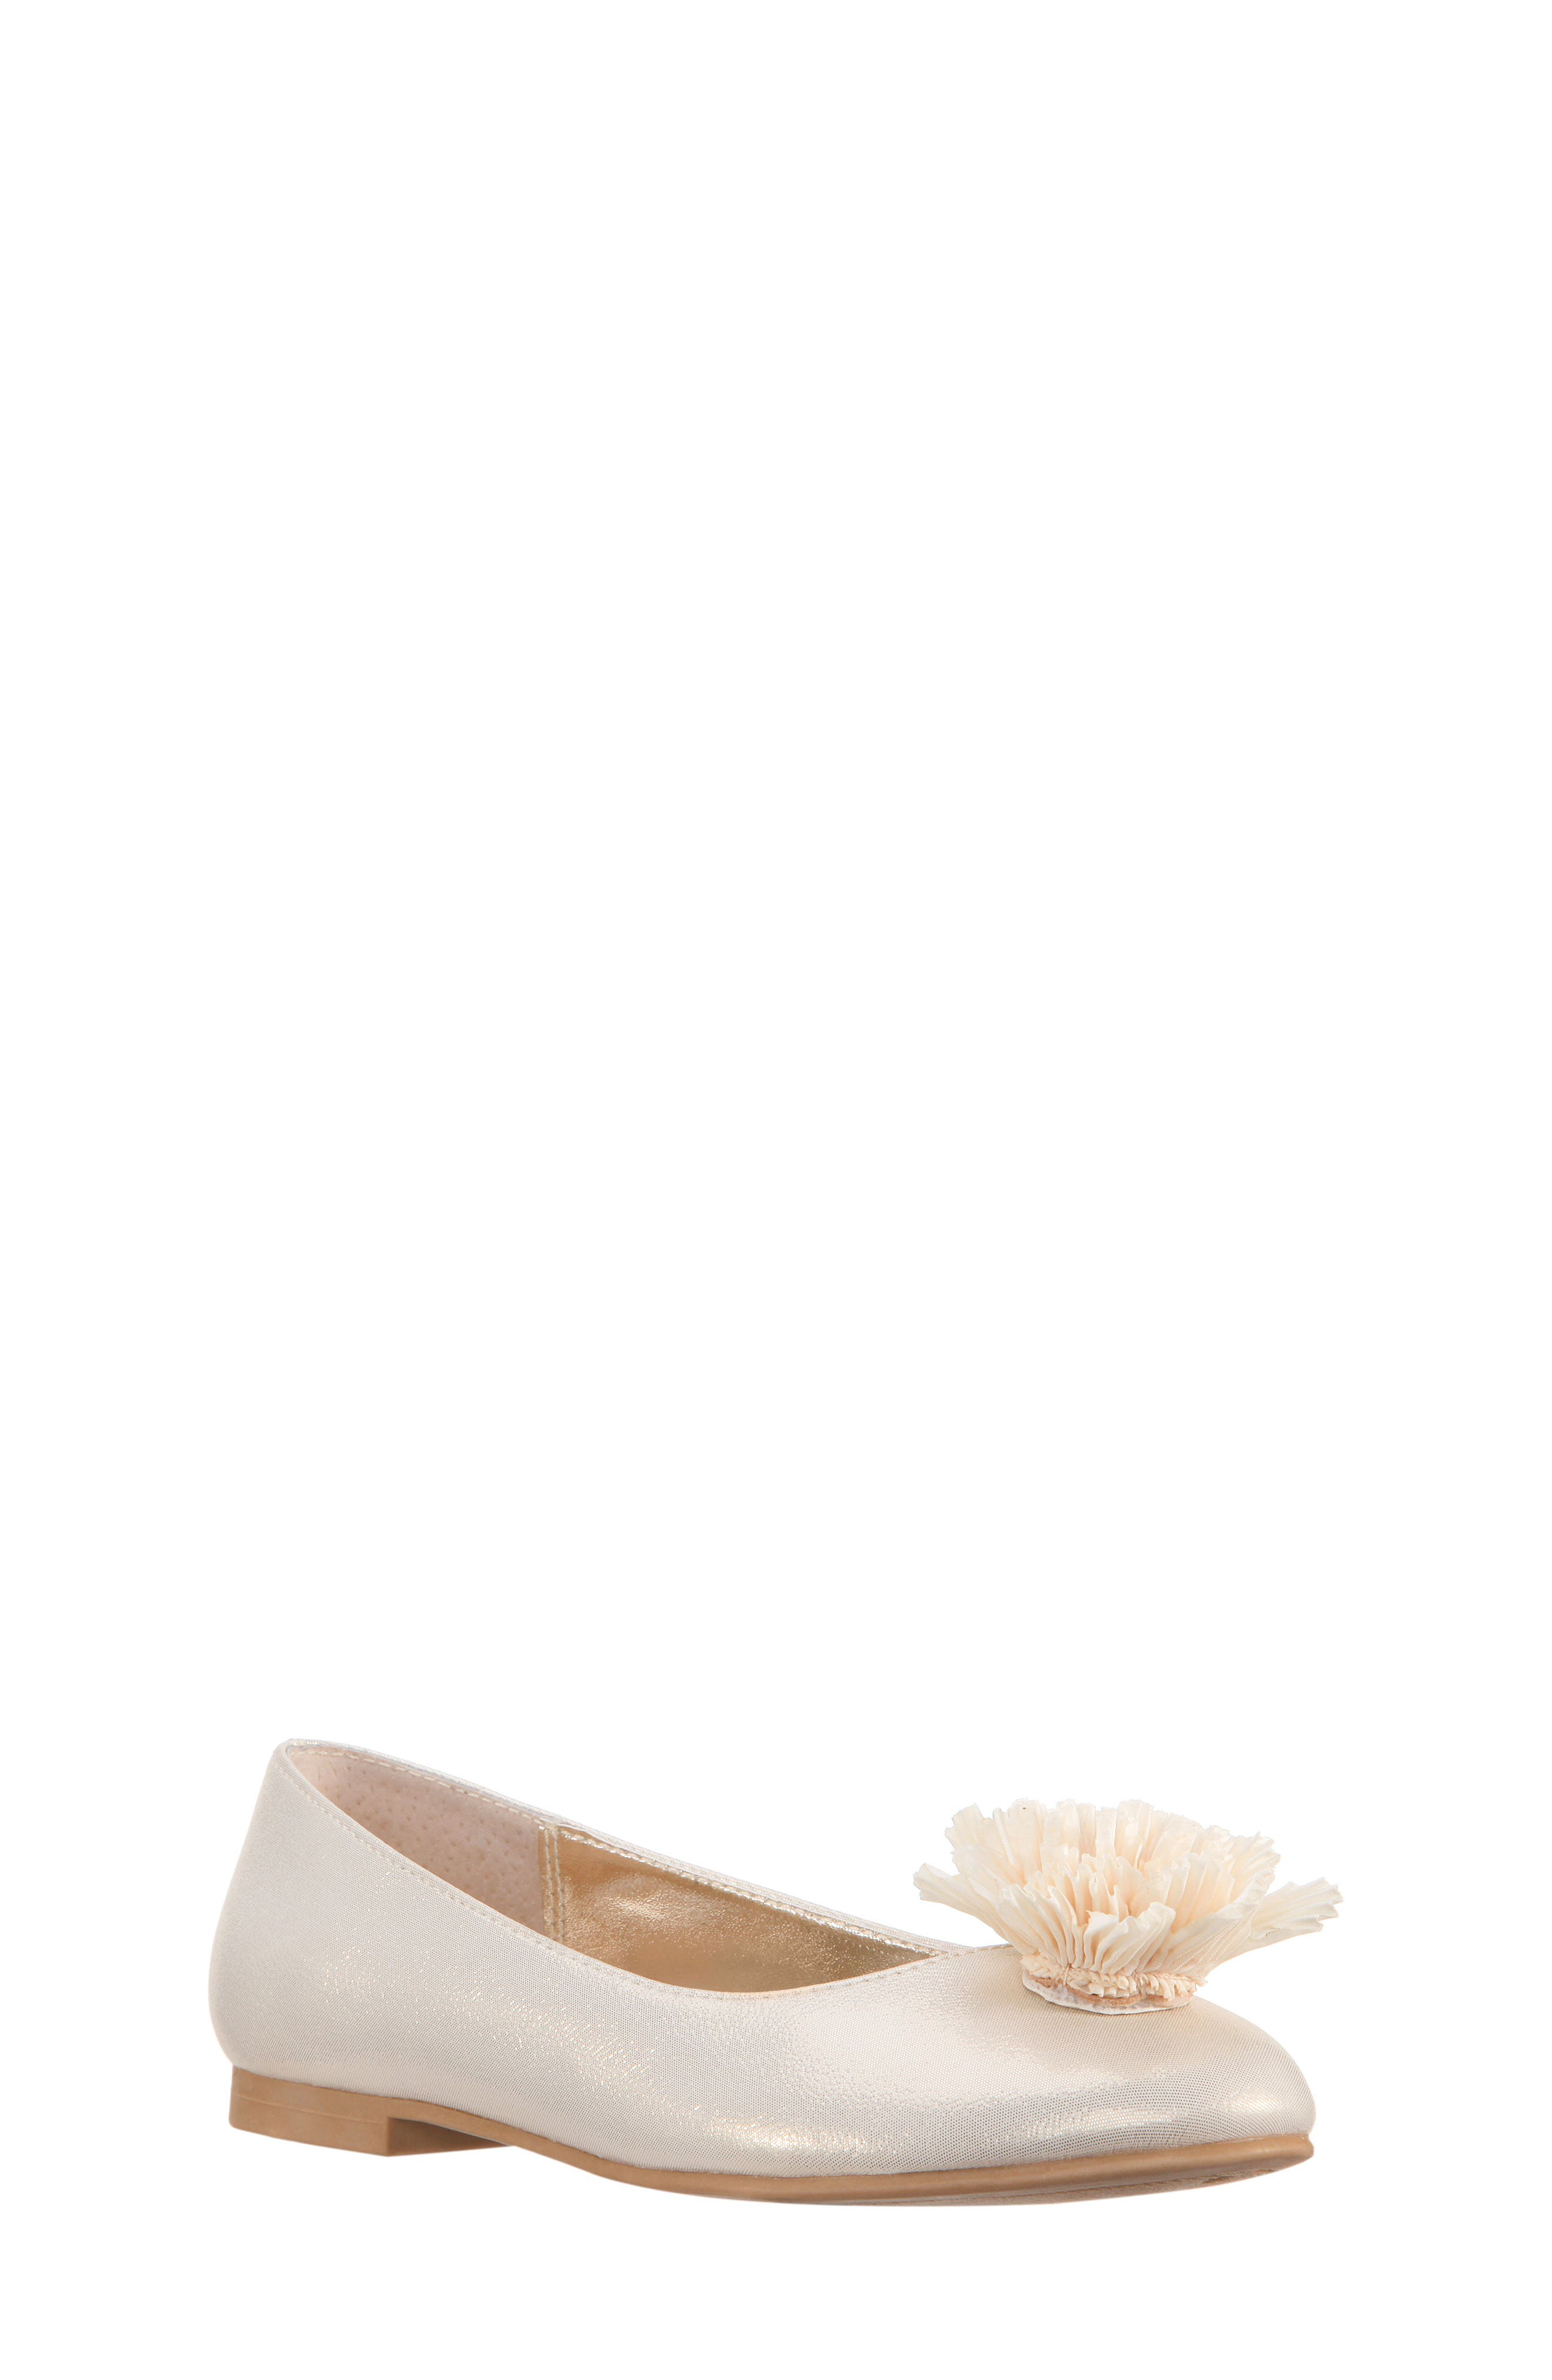 Jemma Flower Ballet Flat,                         Main,                         color, Platino Metallic